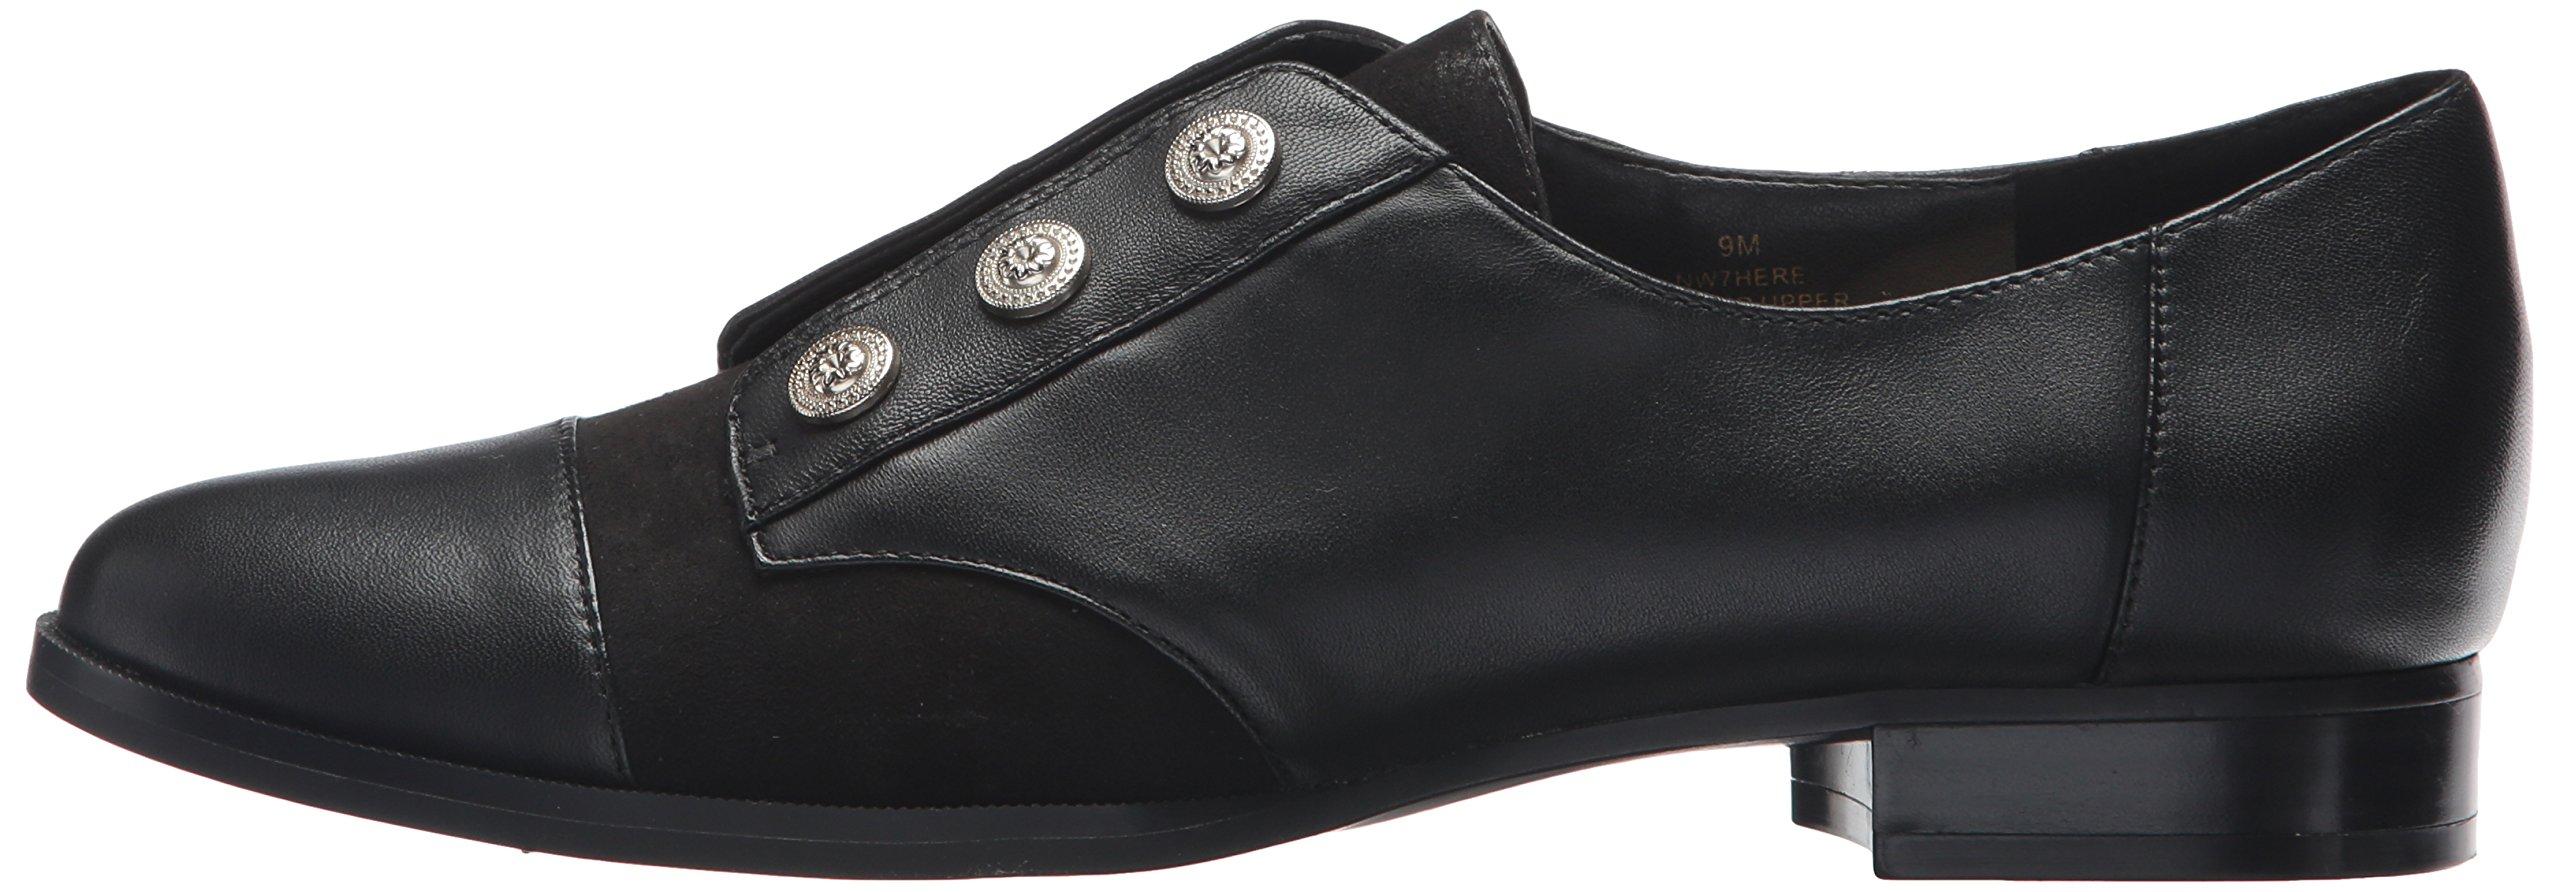 Nine West Women's Here Leather Uniform Dress Shoe, Black/Multi Leather, 5 M US by Nine West (Image #5)